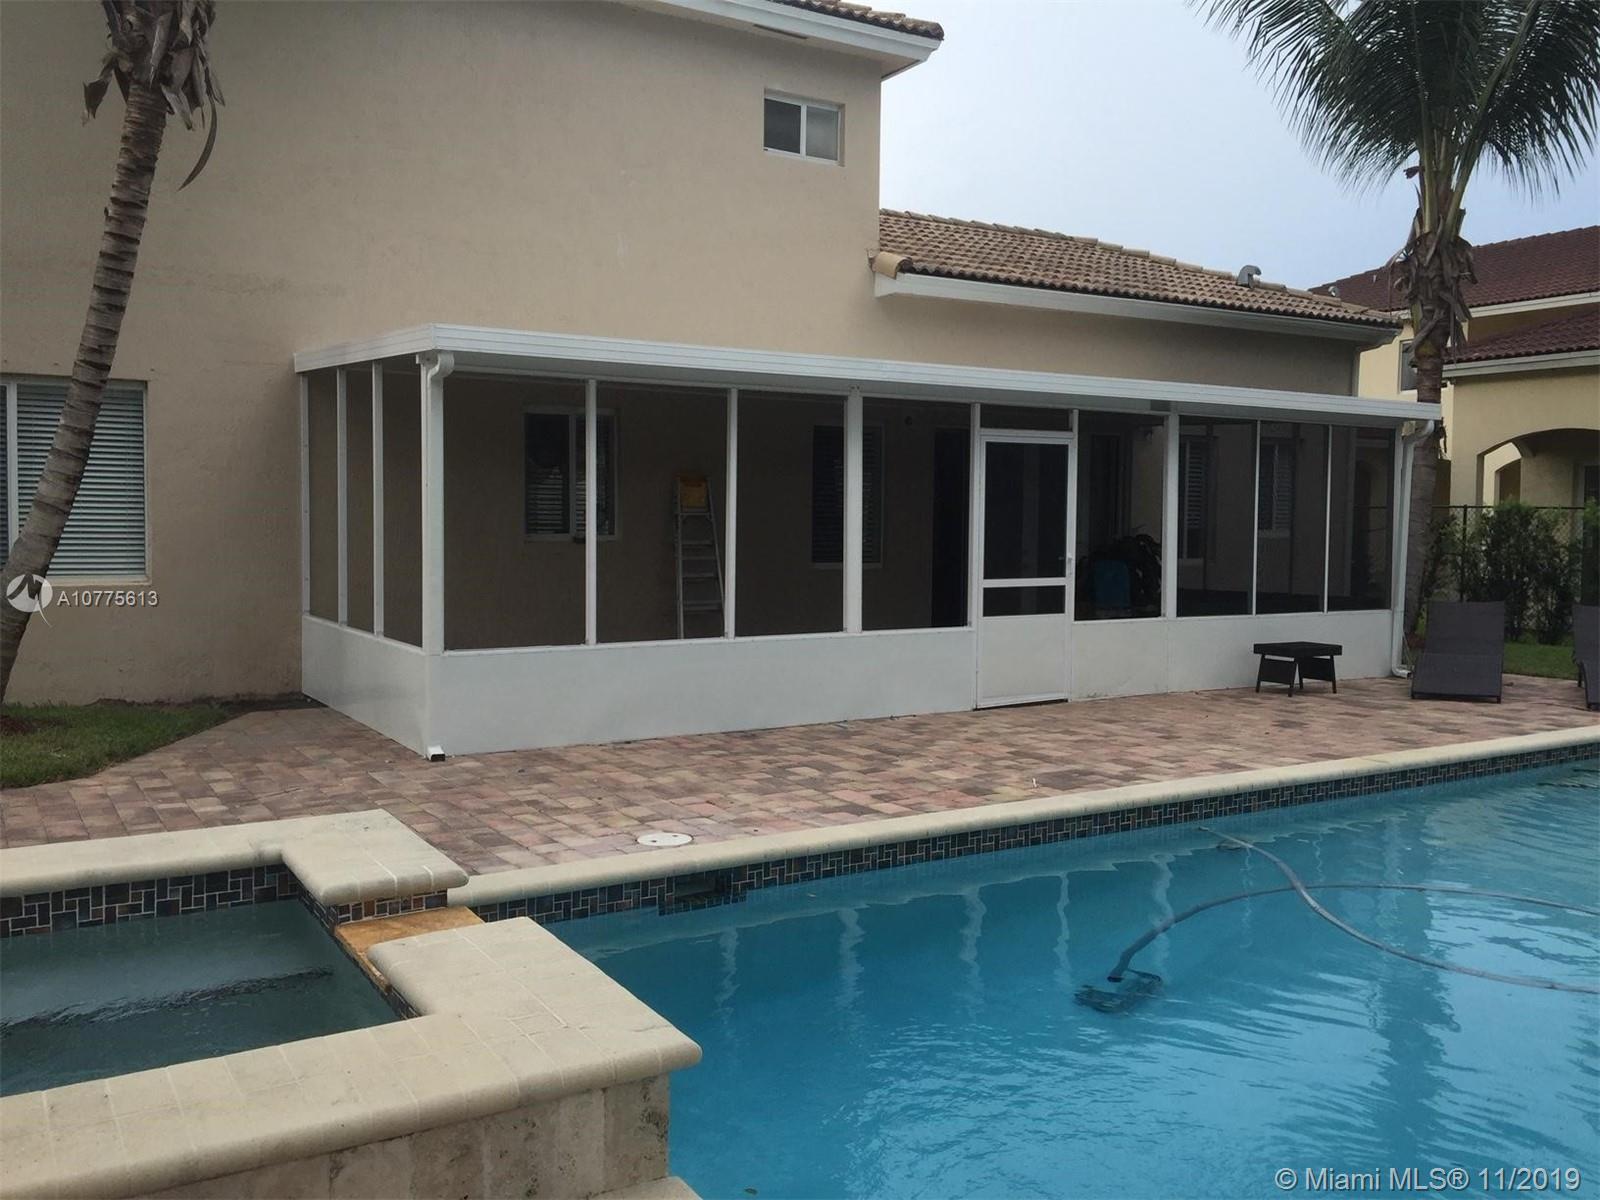 1898 SE 23 rd court, Homestead, FL 33035 - Homestead, FL real estate listing